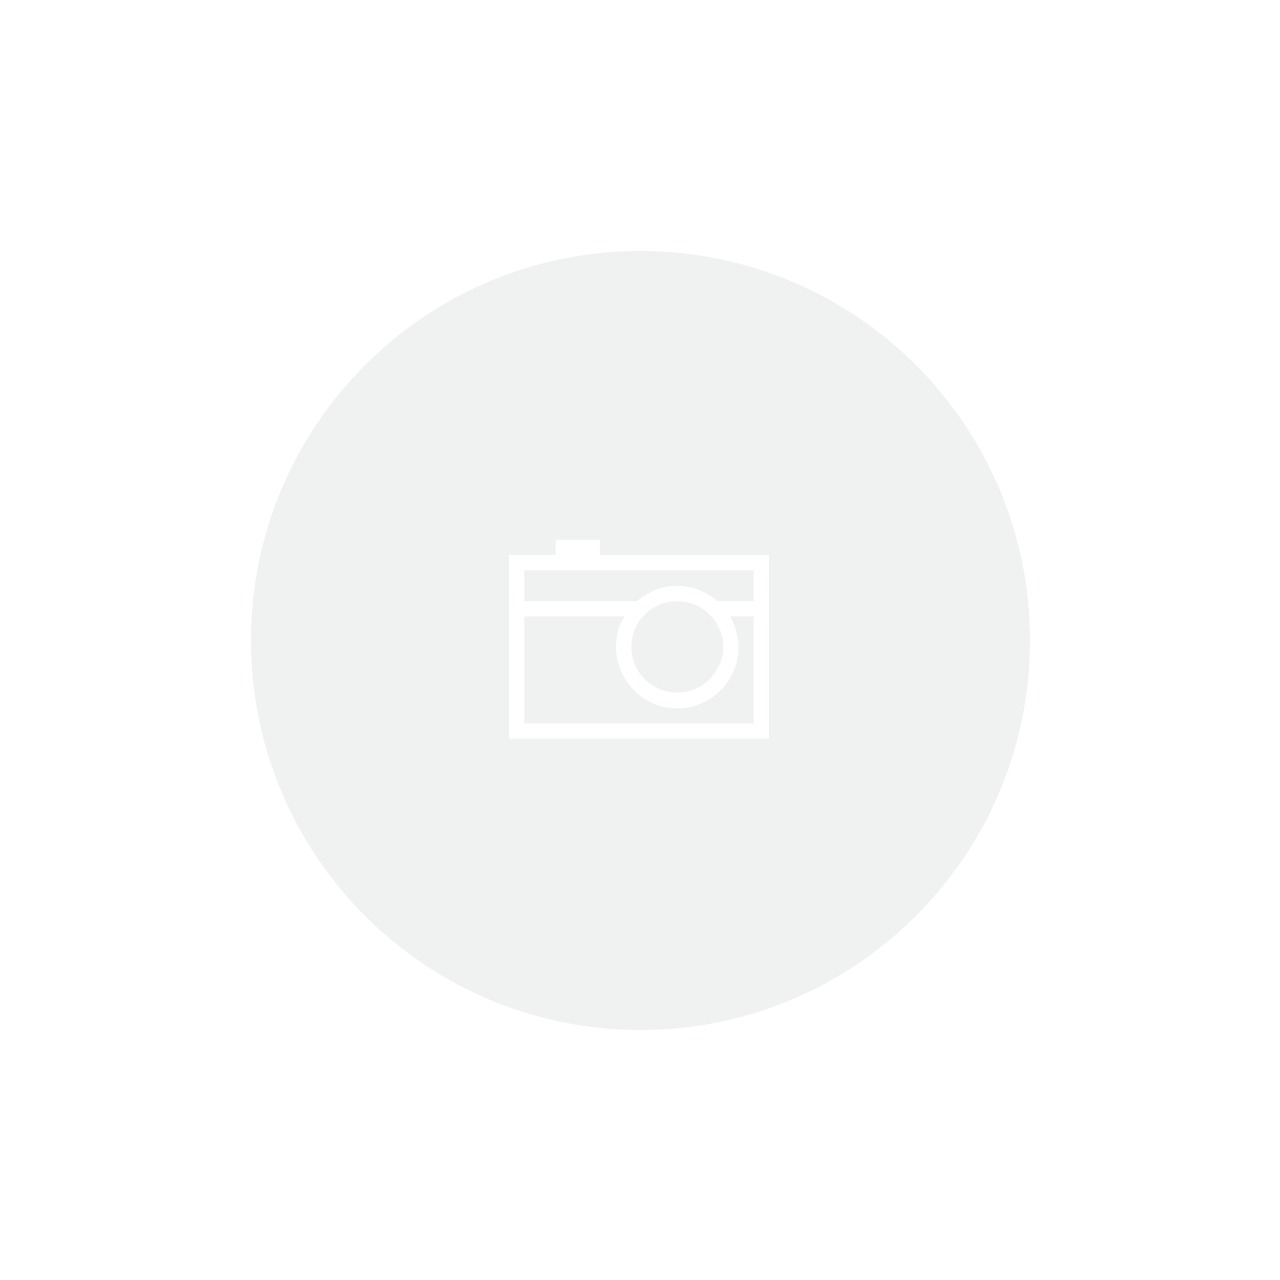 Papel Artesanal Indiano - Ref. 47